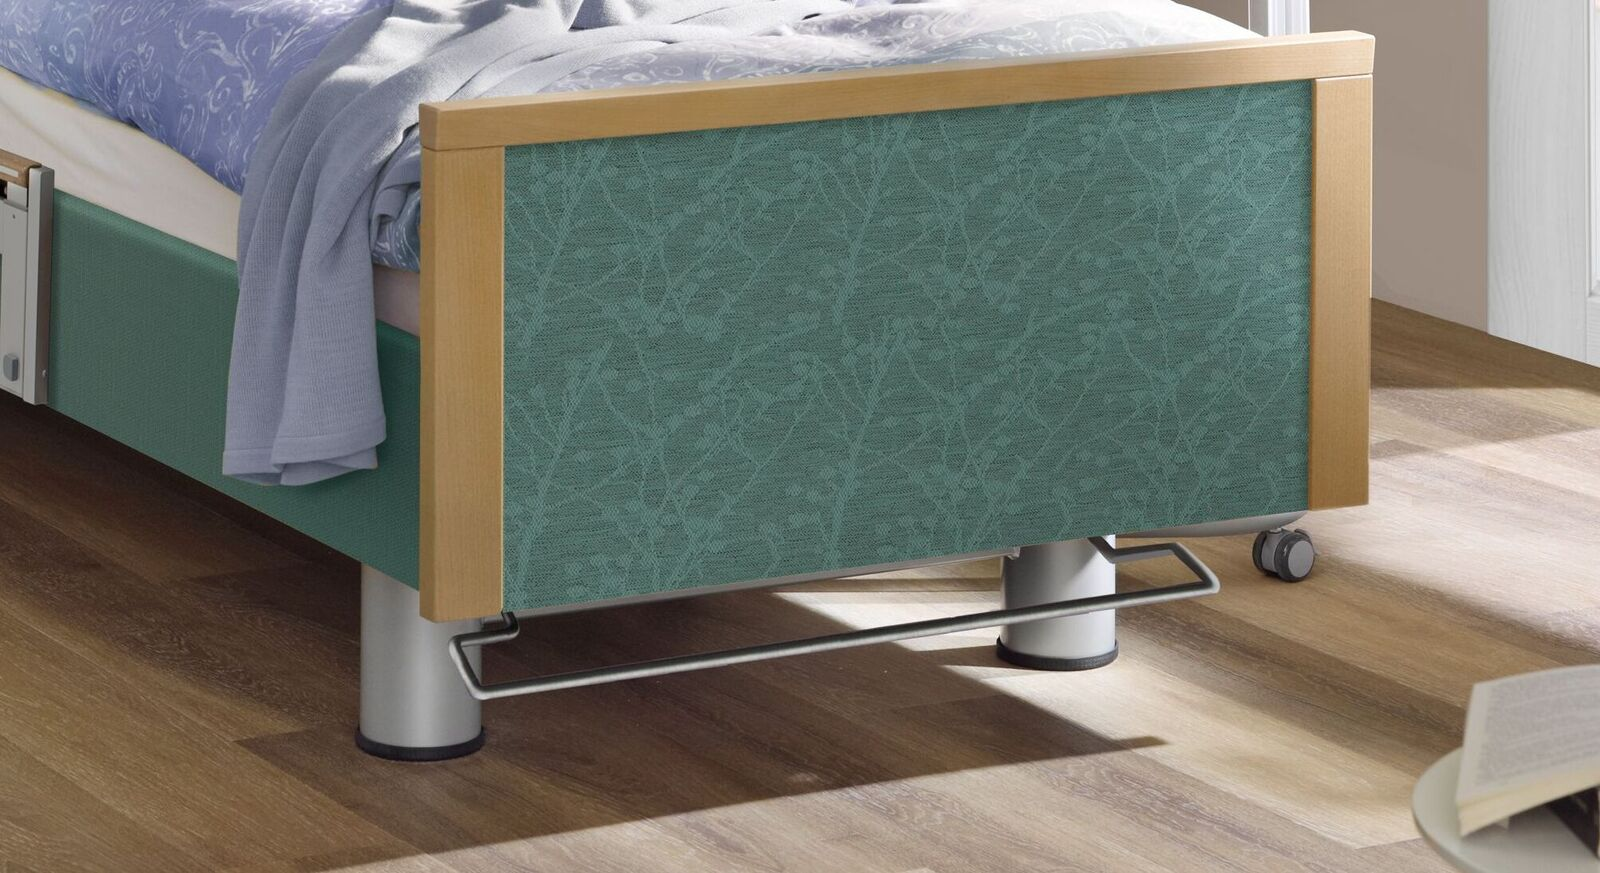 Komfortbett mit Pflegebett-Funktion Sylt mit Metallfüßen